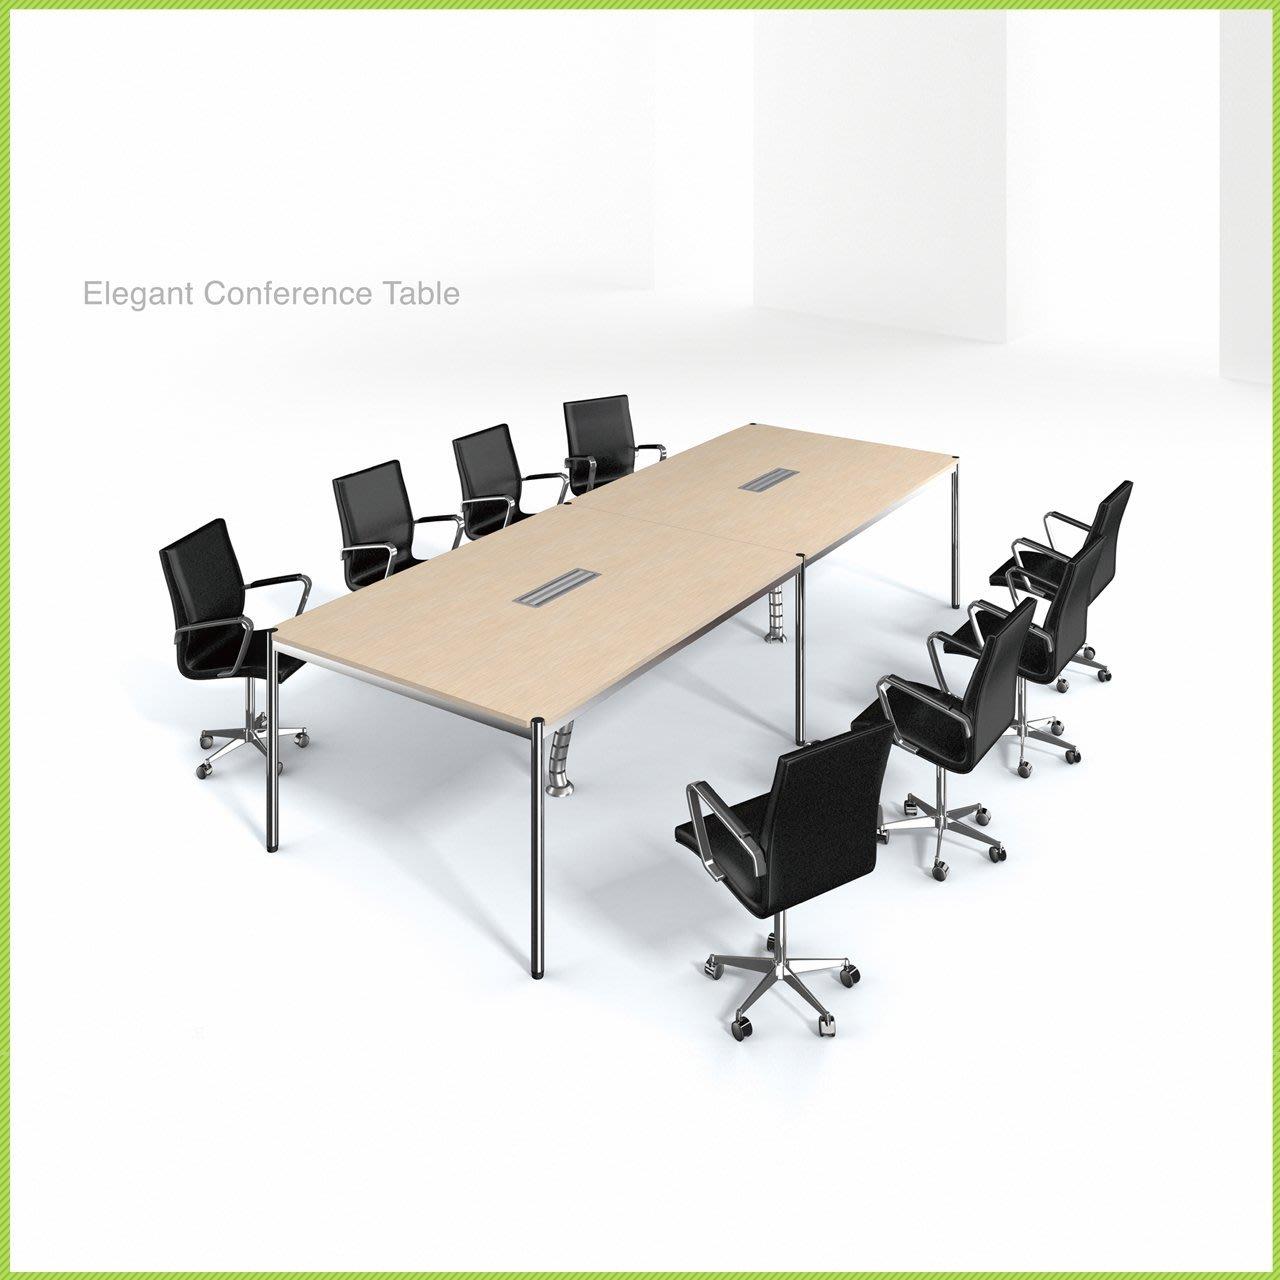 【OA批發工廠】IMMENSE 系統會議桌 洽談桌 美耐板桌 單開線槽盒 大型會議桌 簡約現代設計 客製品需先詢價